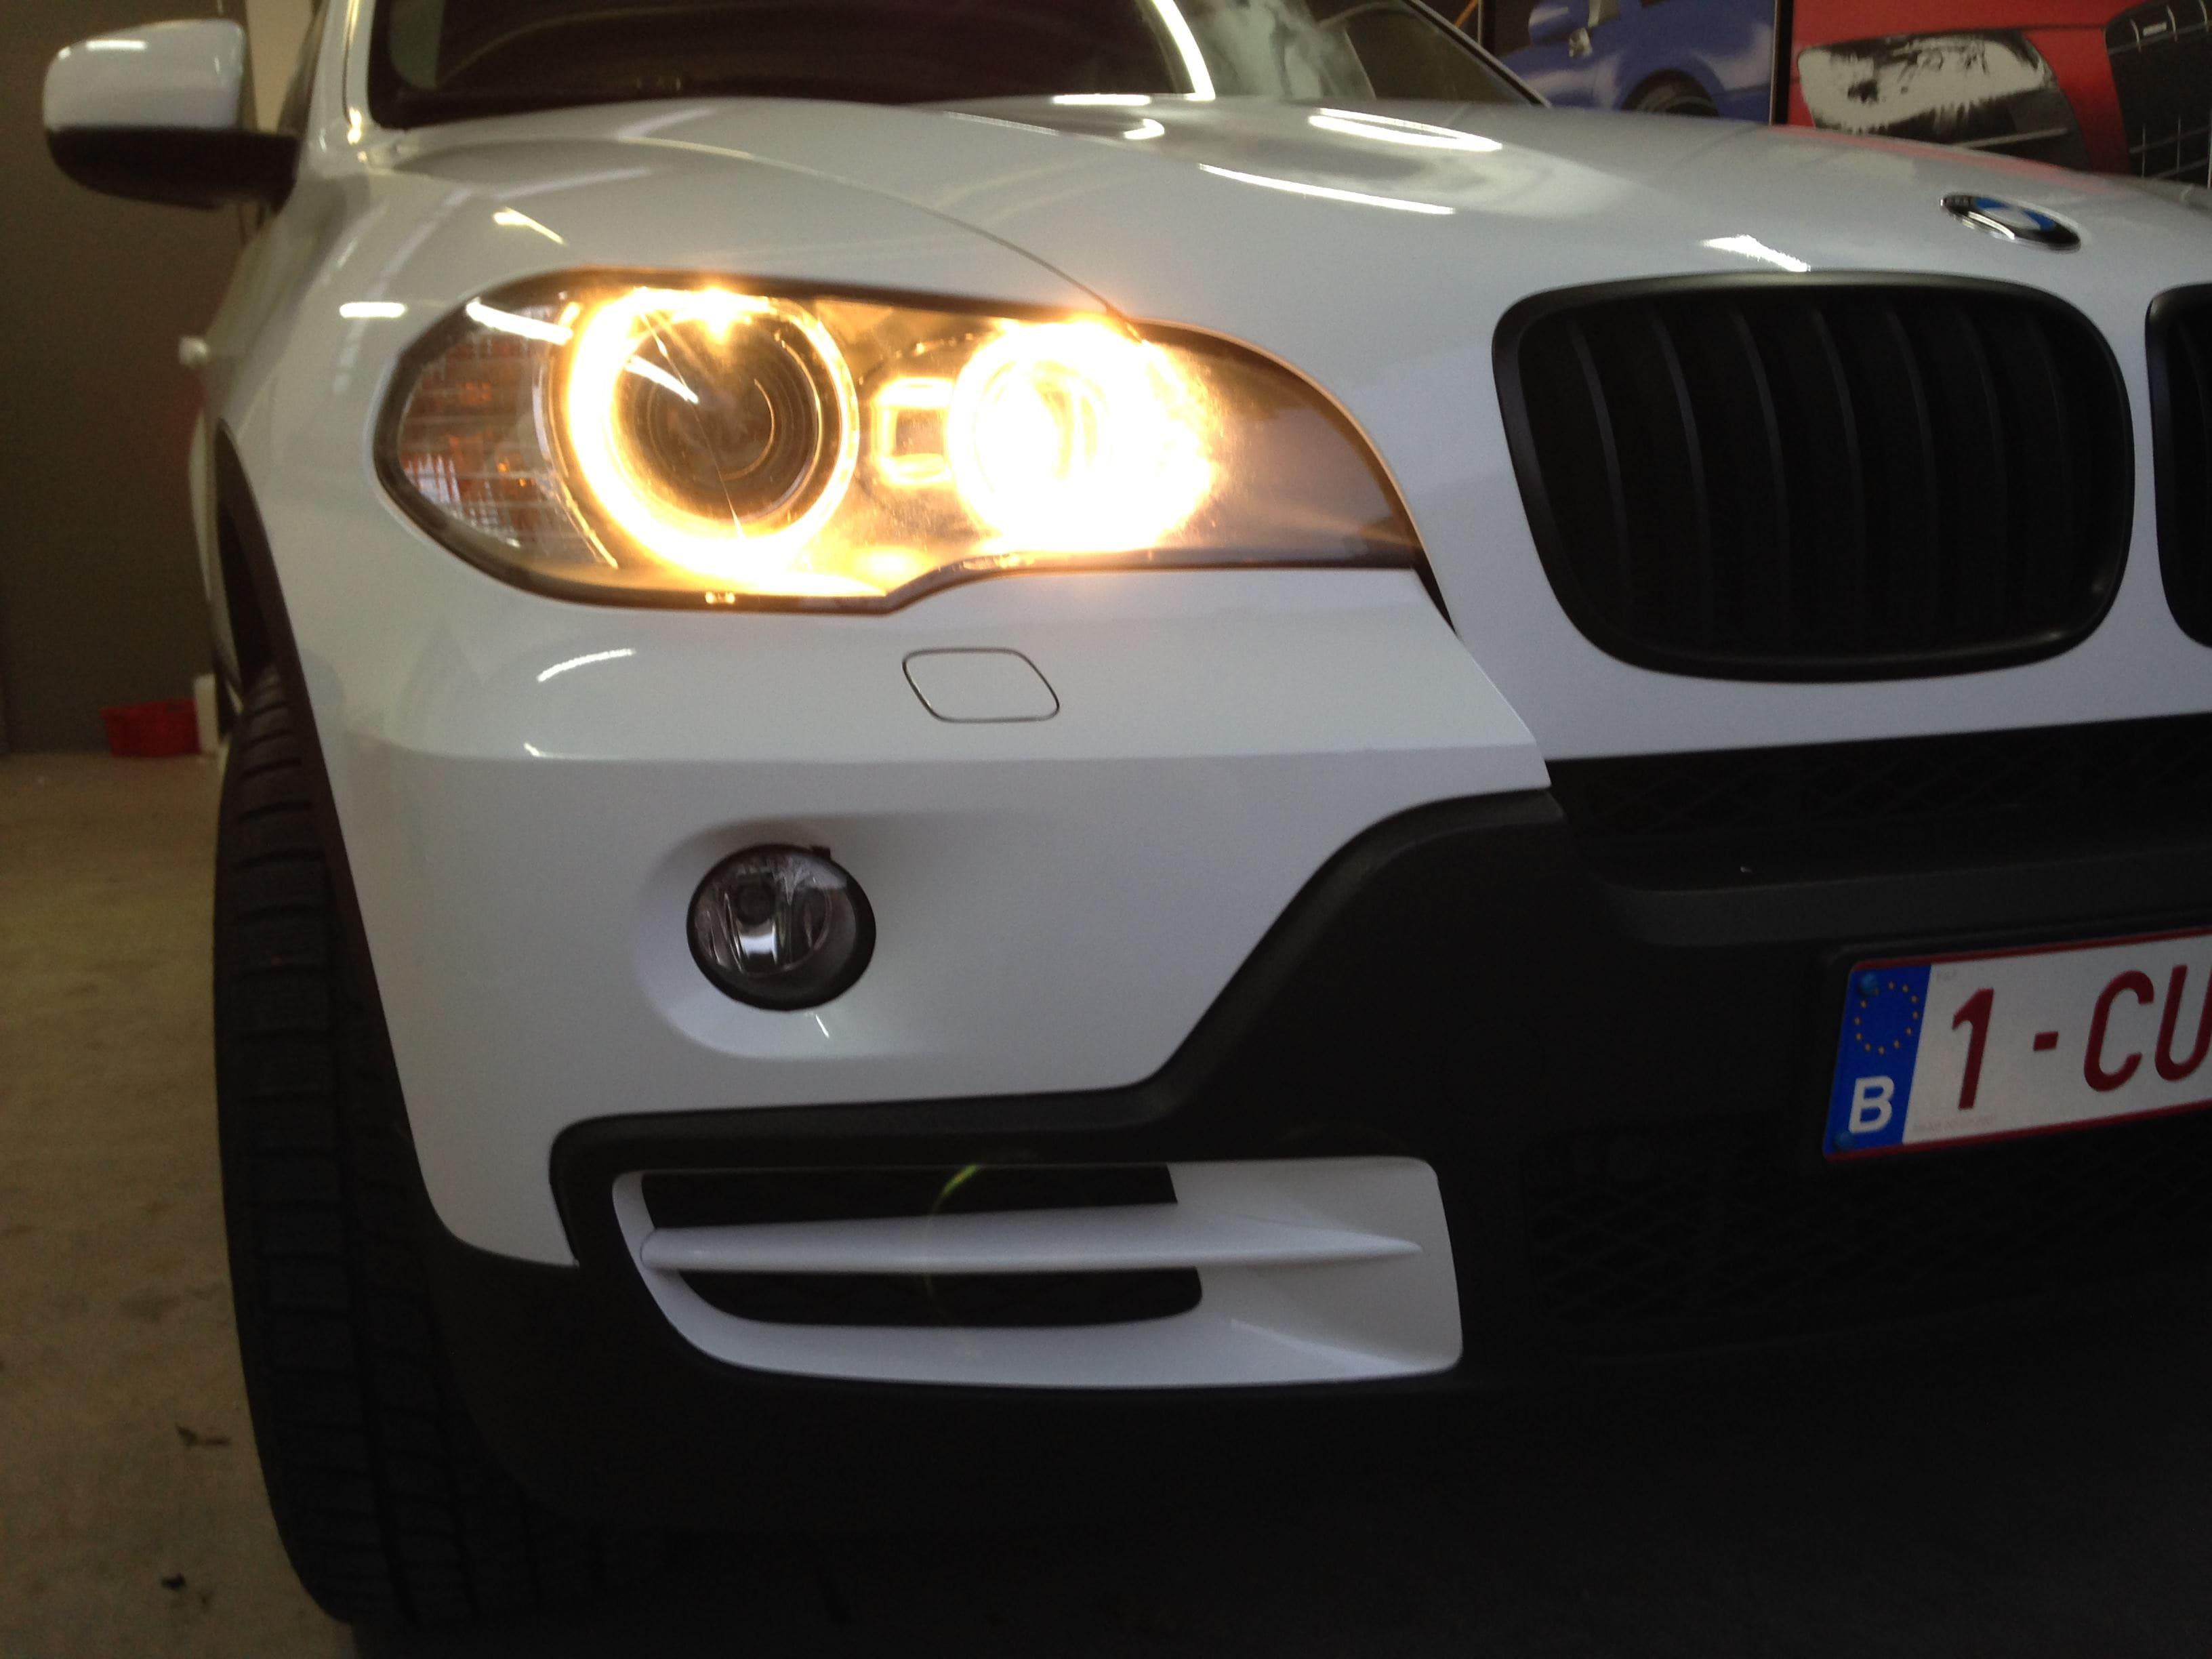 BMW X5 met Glossy White Wrap, Carwrapping door Wrapmyride.nu Foto-nr:5429, ©2021